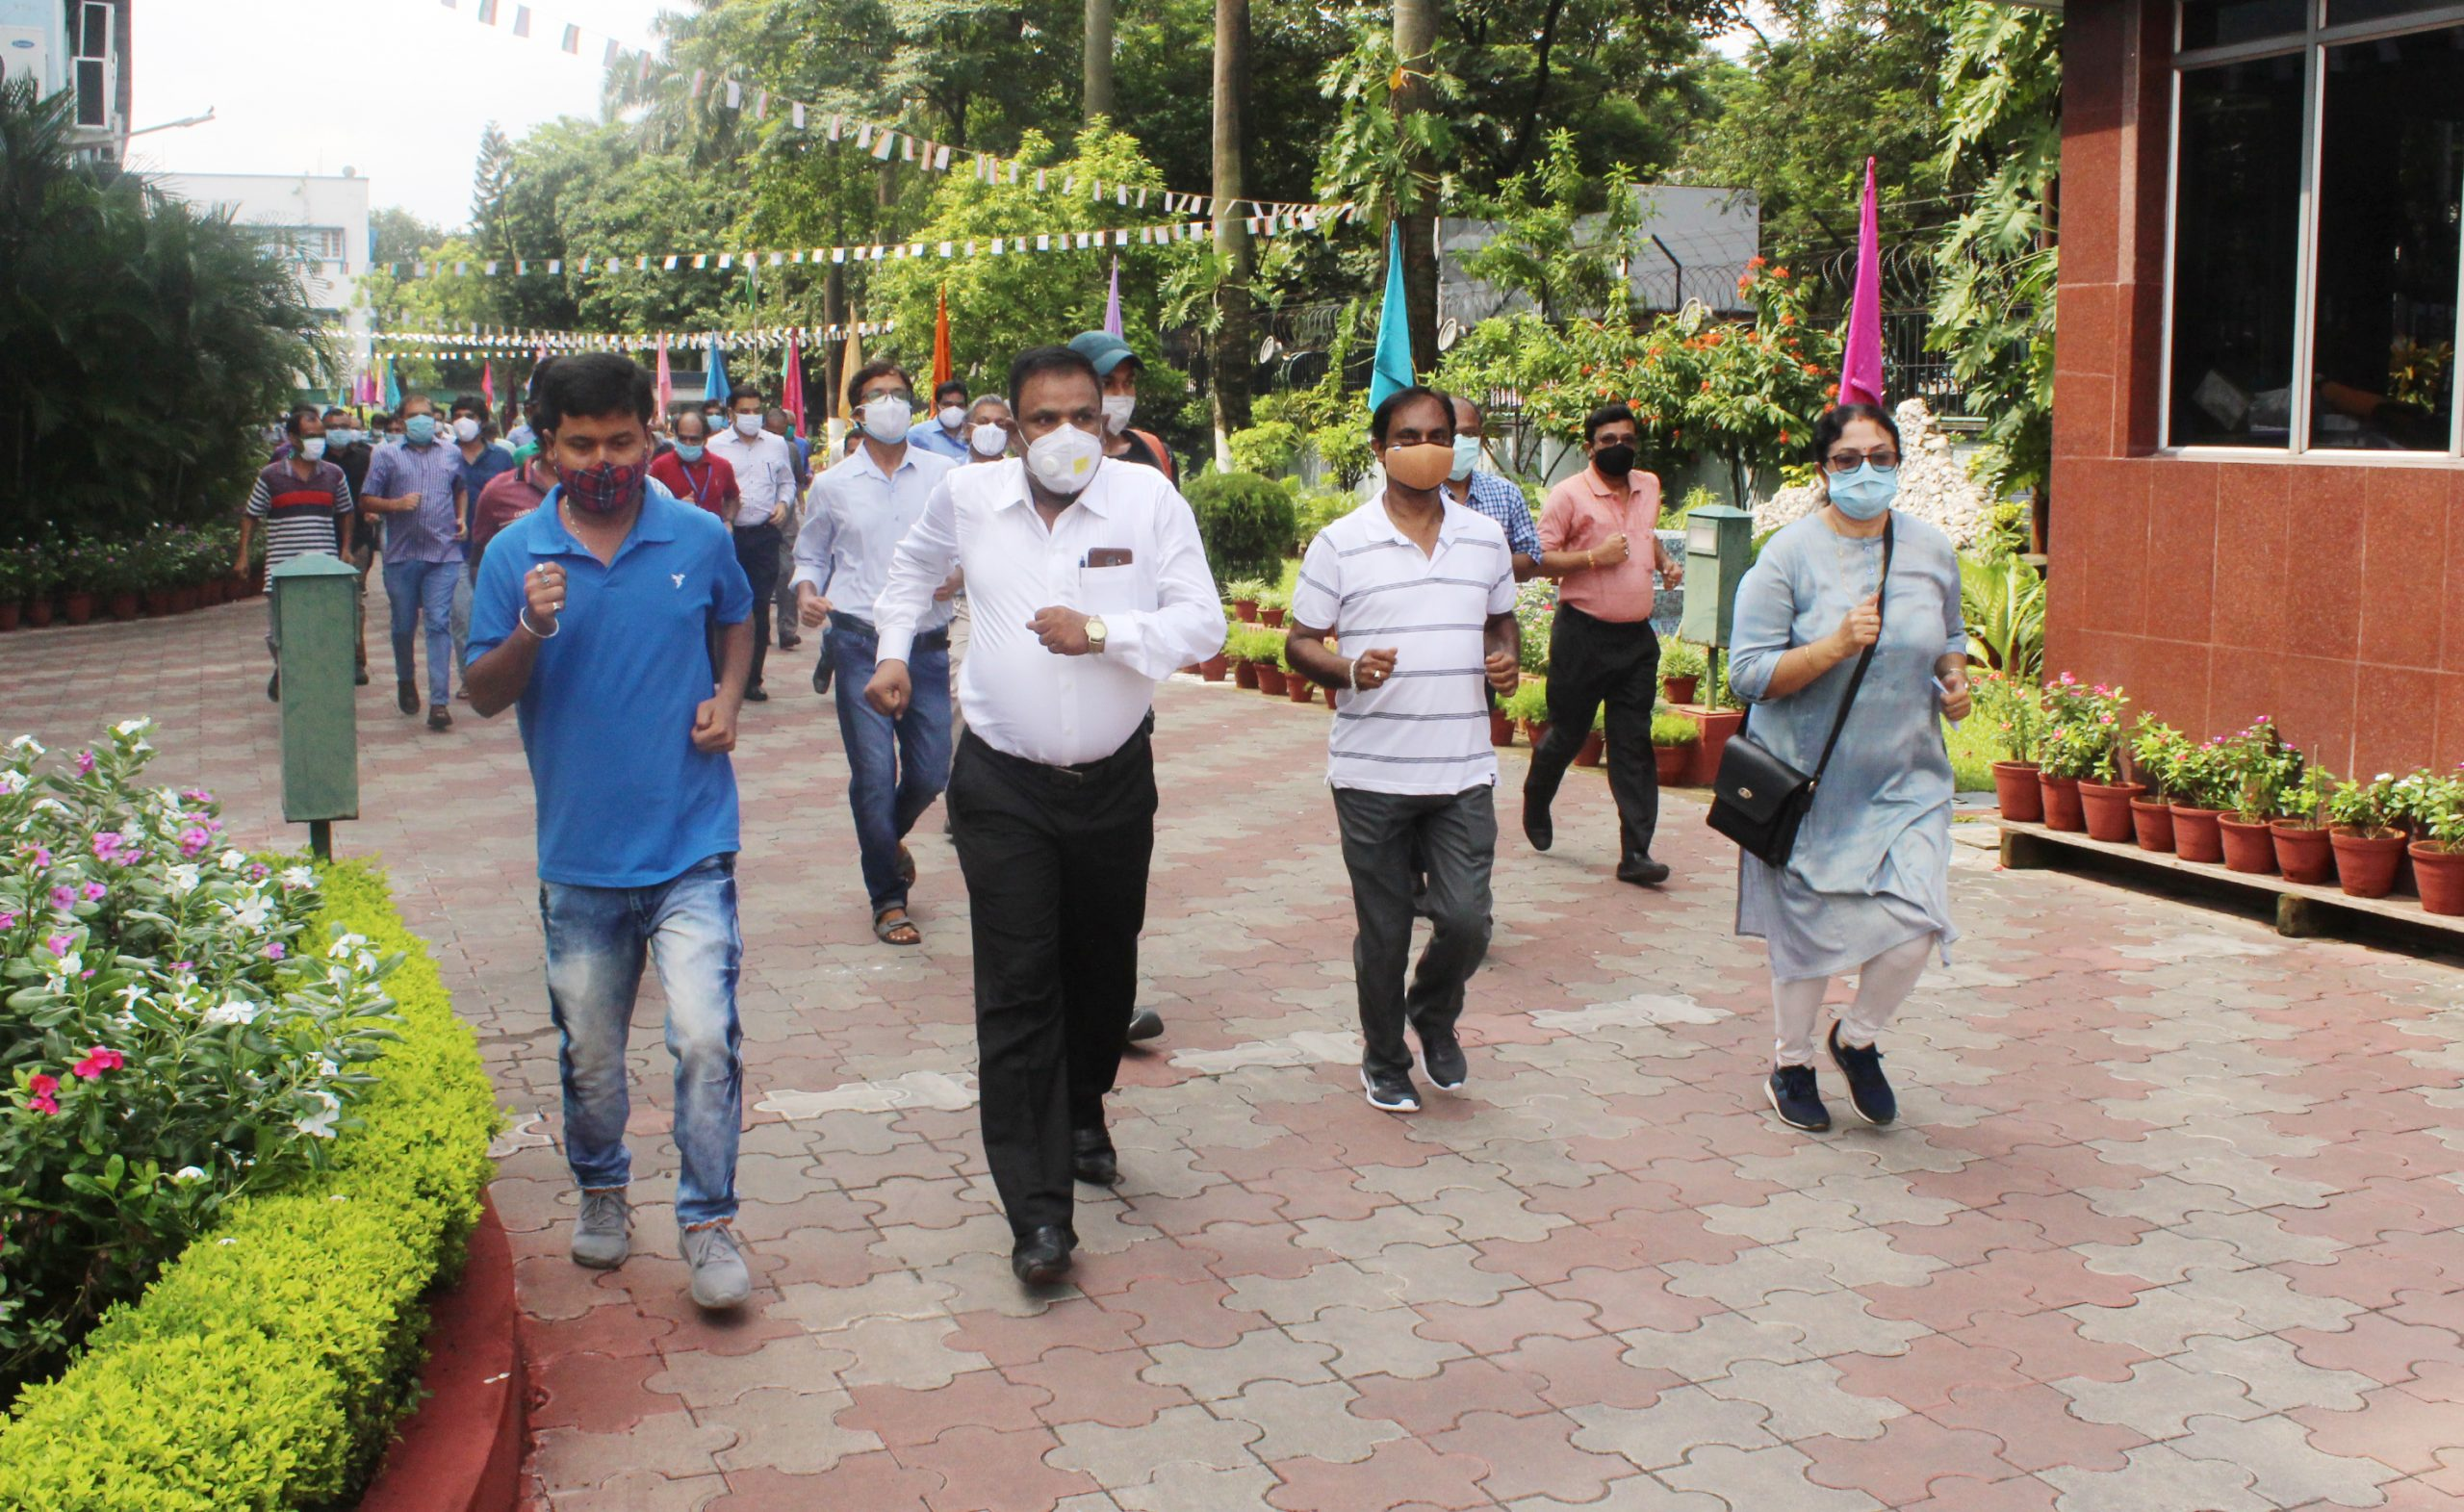 Celebration of 75th Independence Day at CSIR-CGCRI, Kolkata